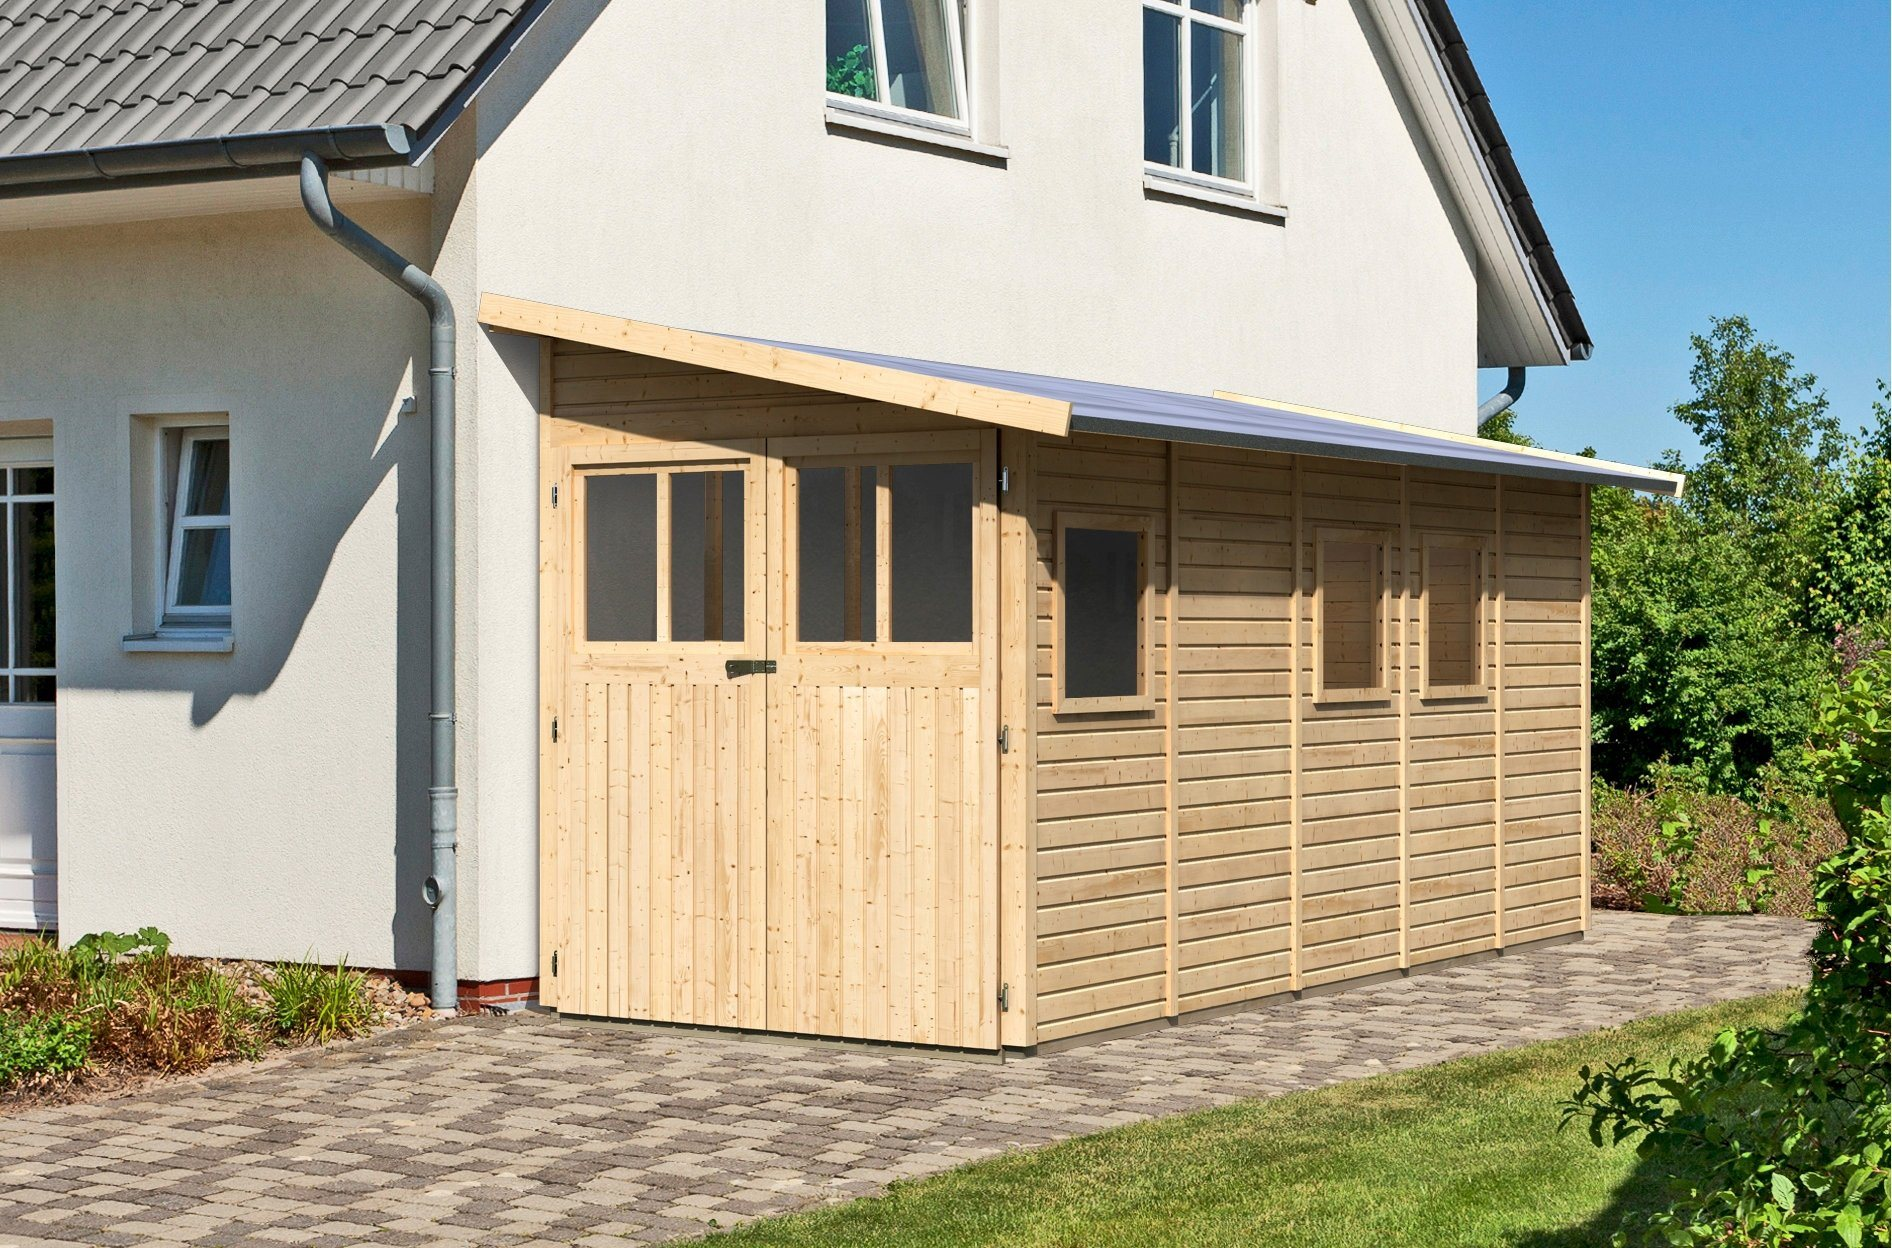 KARIBU Anlehngartenhaus »Wittenburg 5«, BxT: 200x469 cm | Garten > Gartenhäuser | Karibu